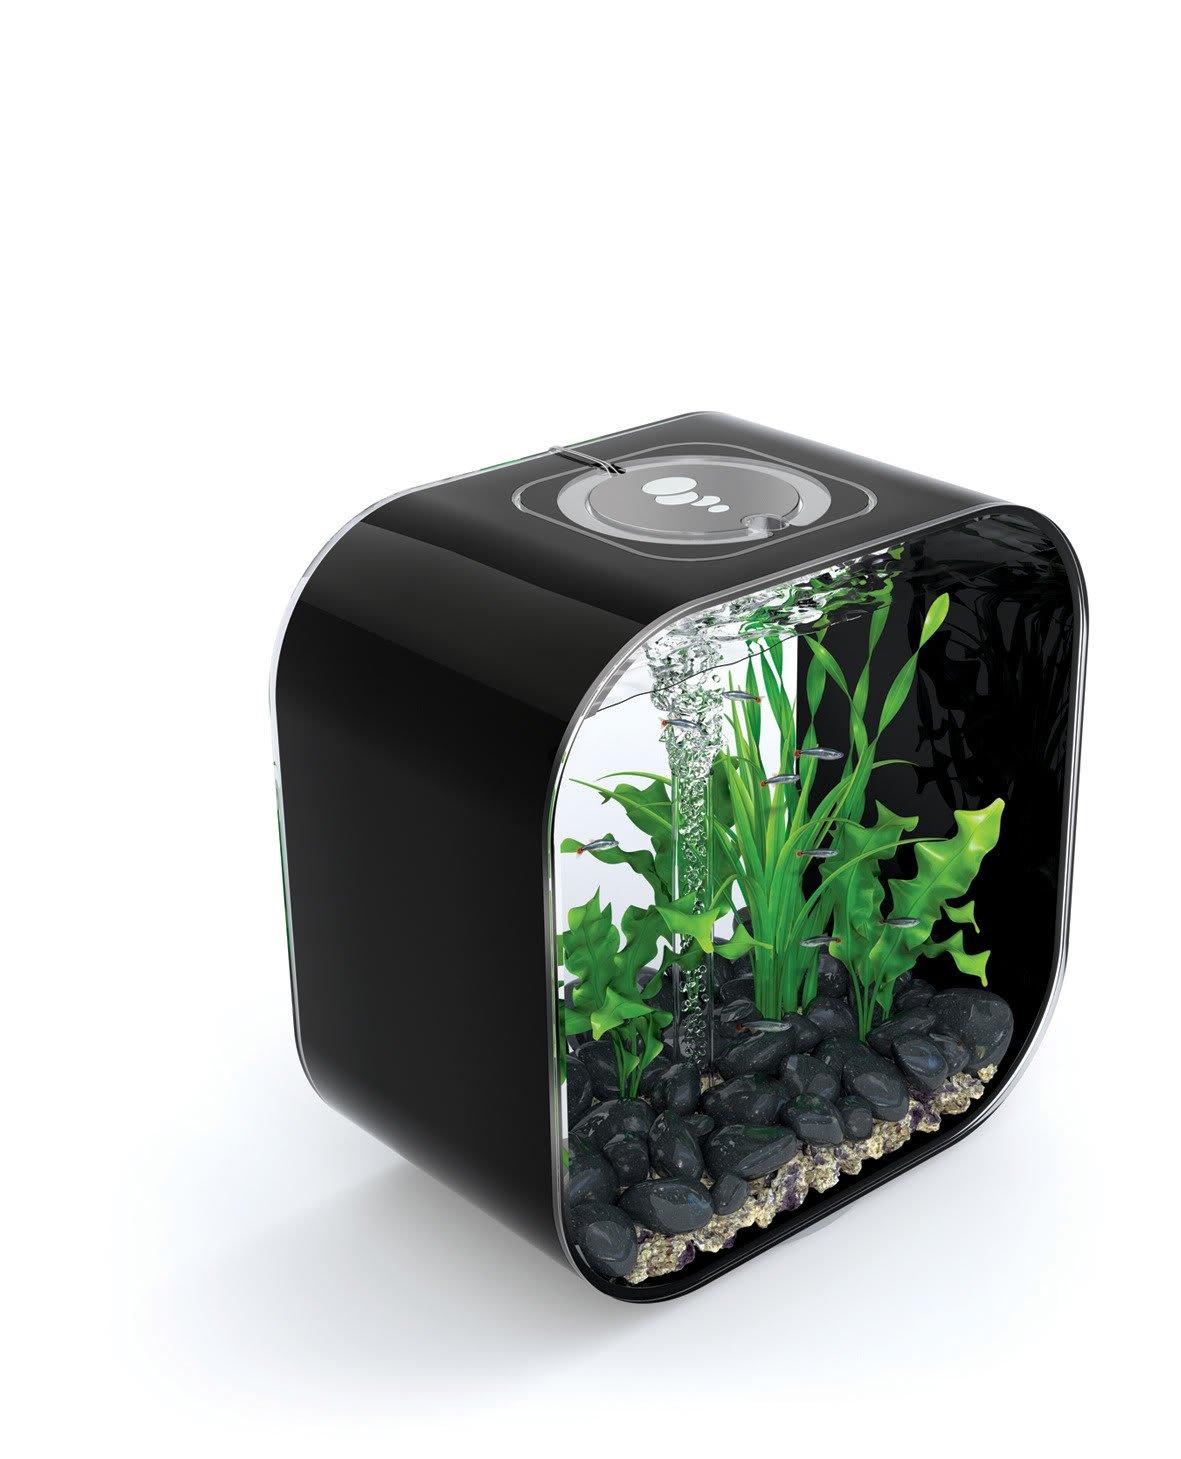 biOrb Life Square 30 Cold Water, Black, Intelligent 24hr LED Light